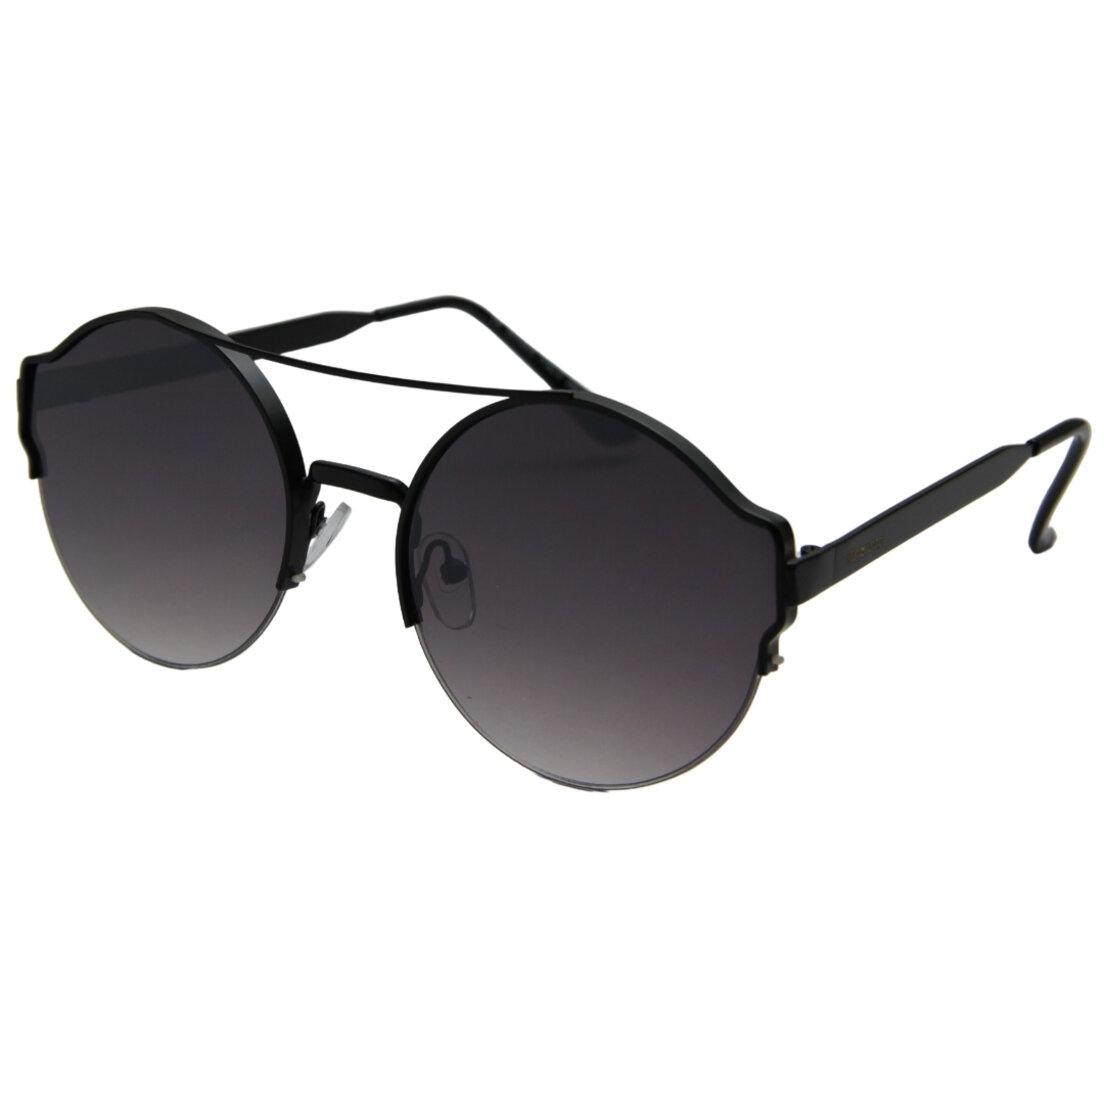 OUTLET - Óculos de Sol Khatto Round Details Italiano